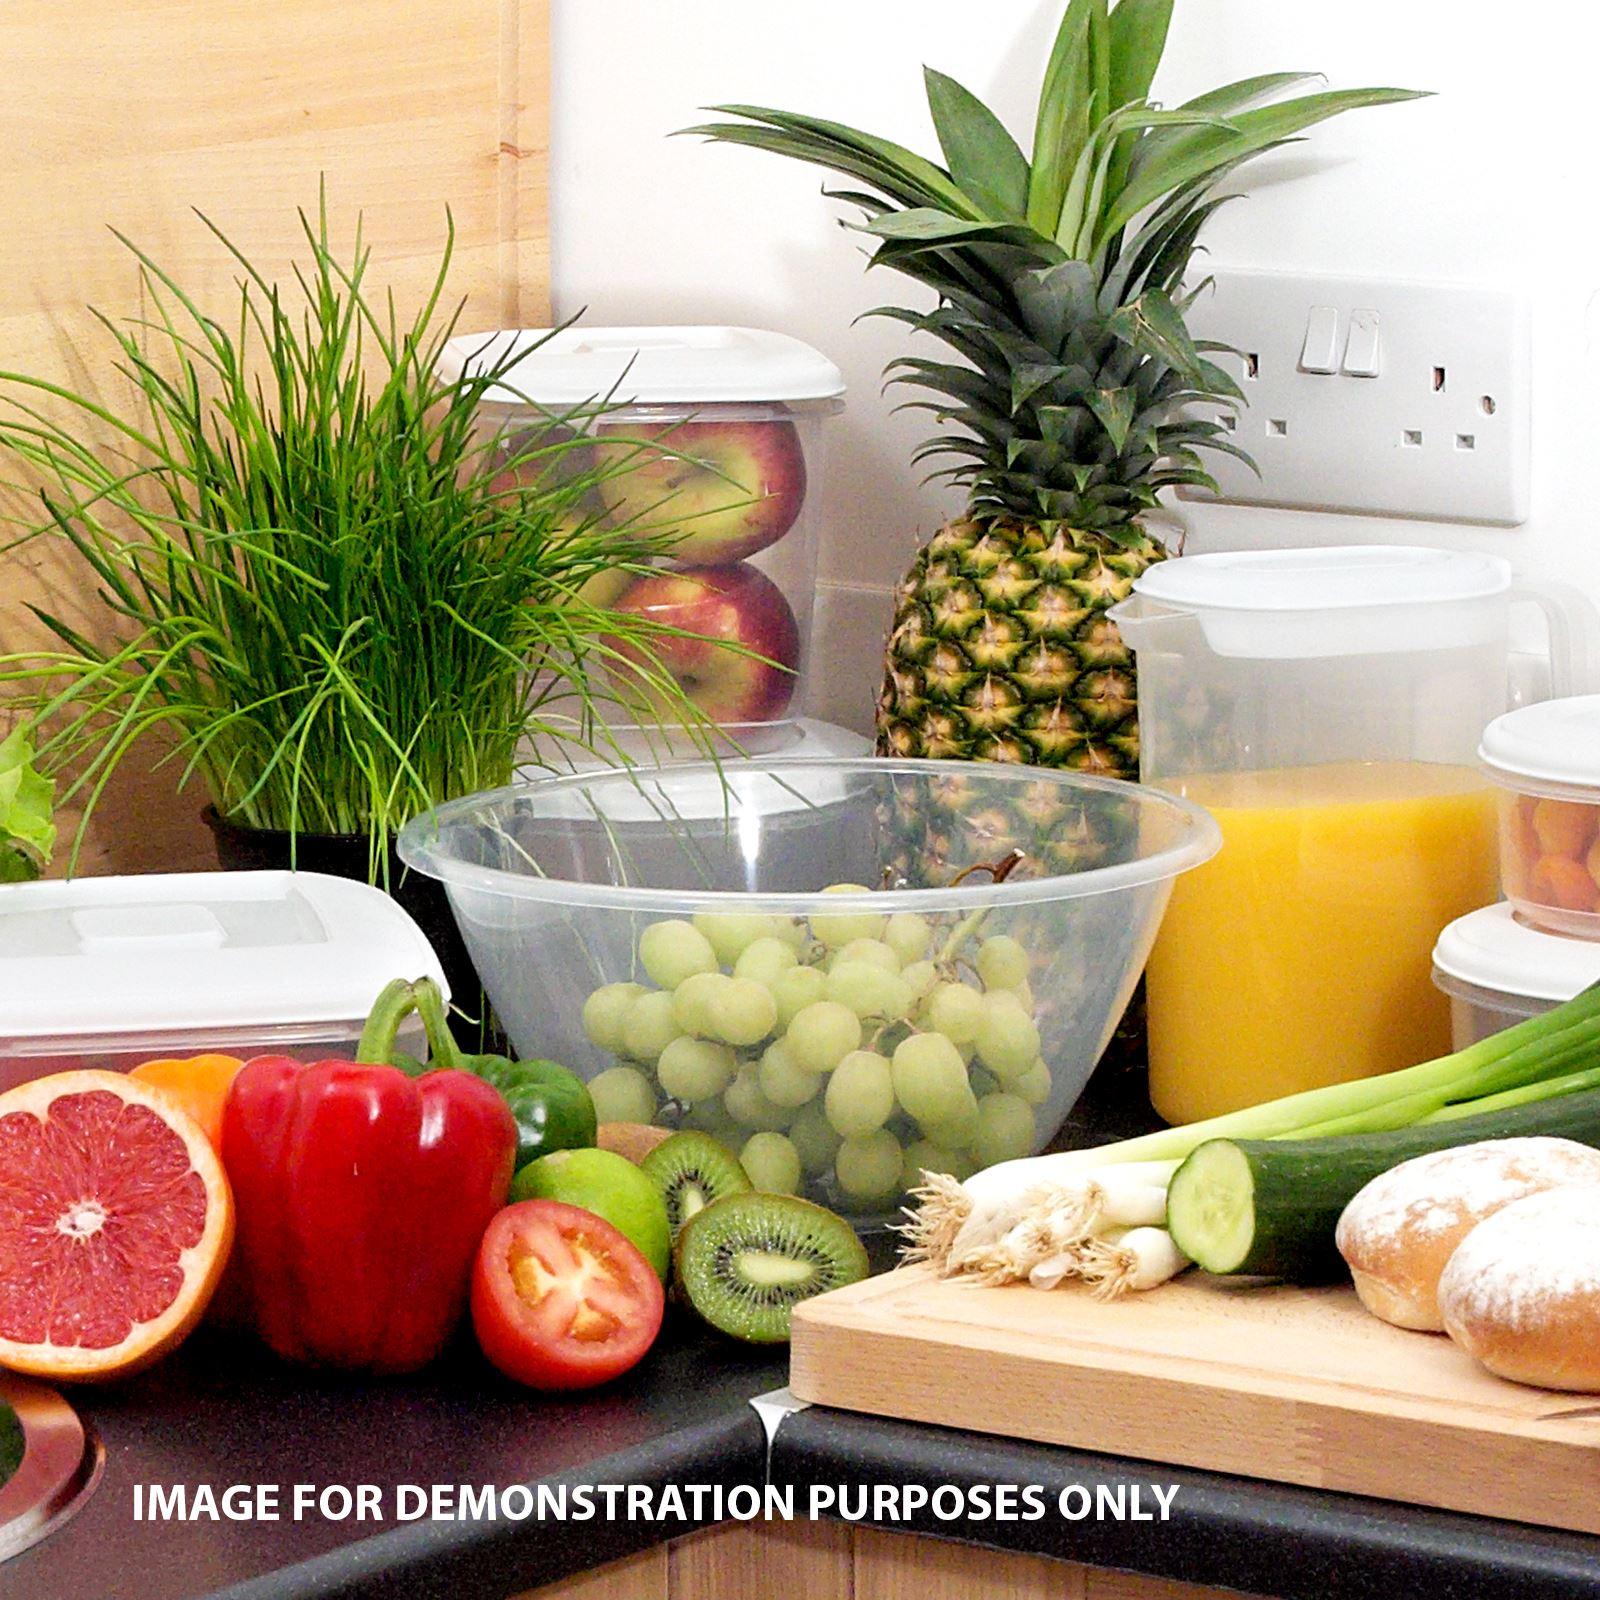 Clear-Plastic-Mixing-Bowl-Measuring-Baking-Salad-Serving-Cooking-Kitchen-Bowls thumbnail 7